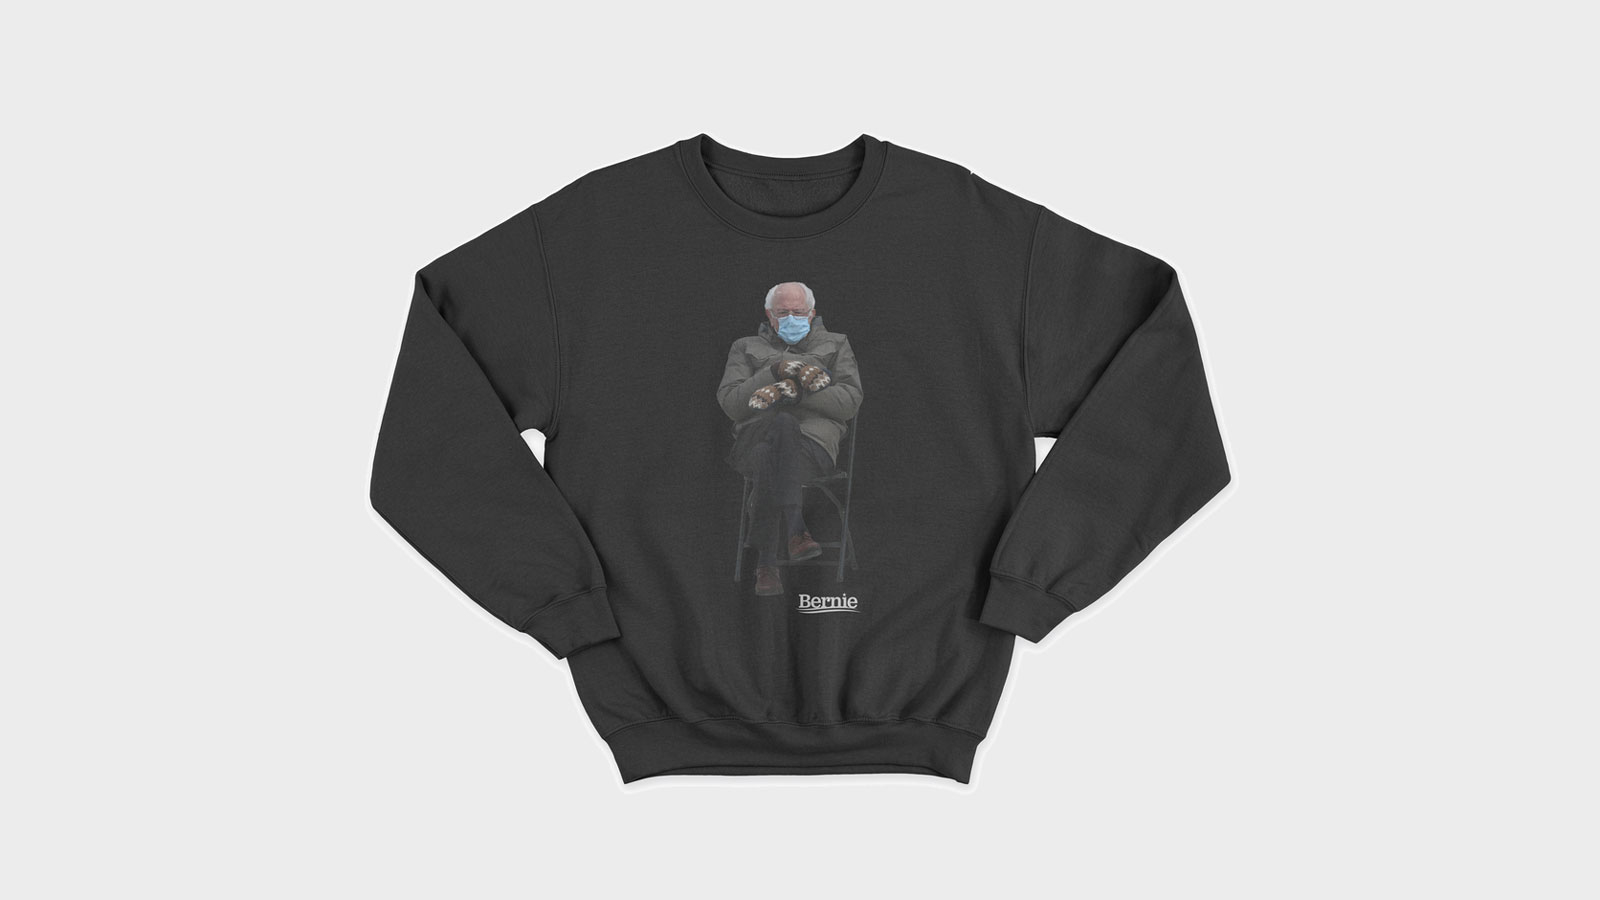 Bernie Mittens Sanders Turns Chair Meme Into Sweatshirt For Meals On Wheels Charity Abc7 San Francisco